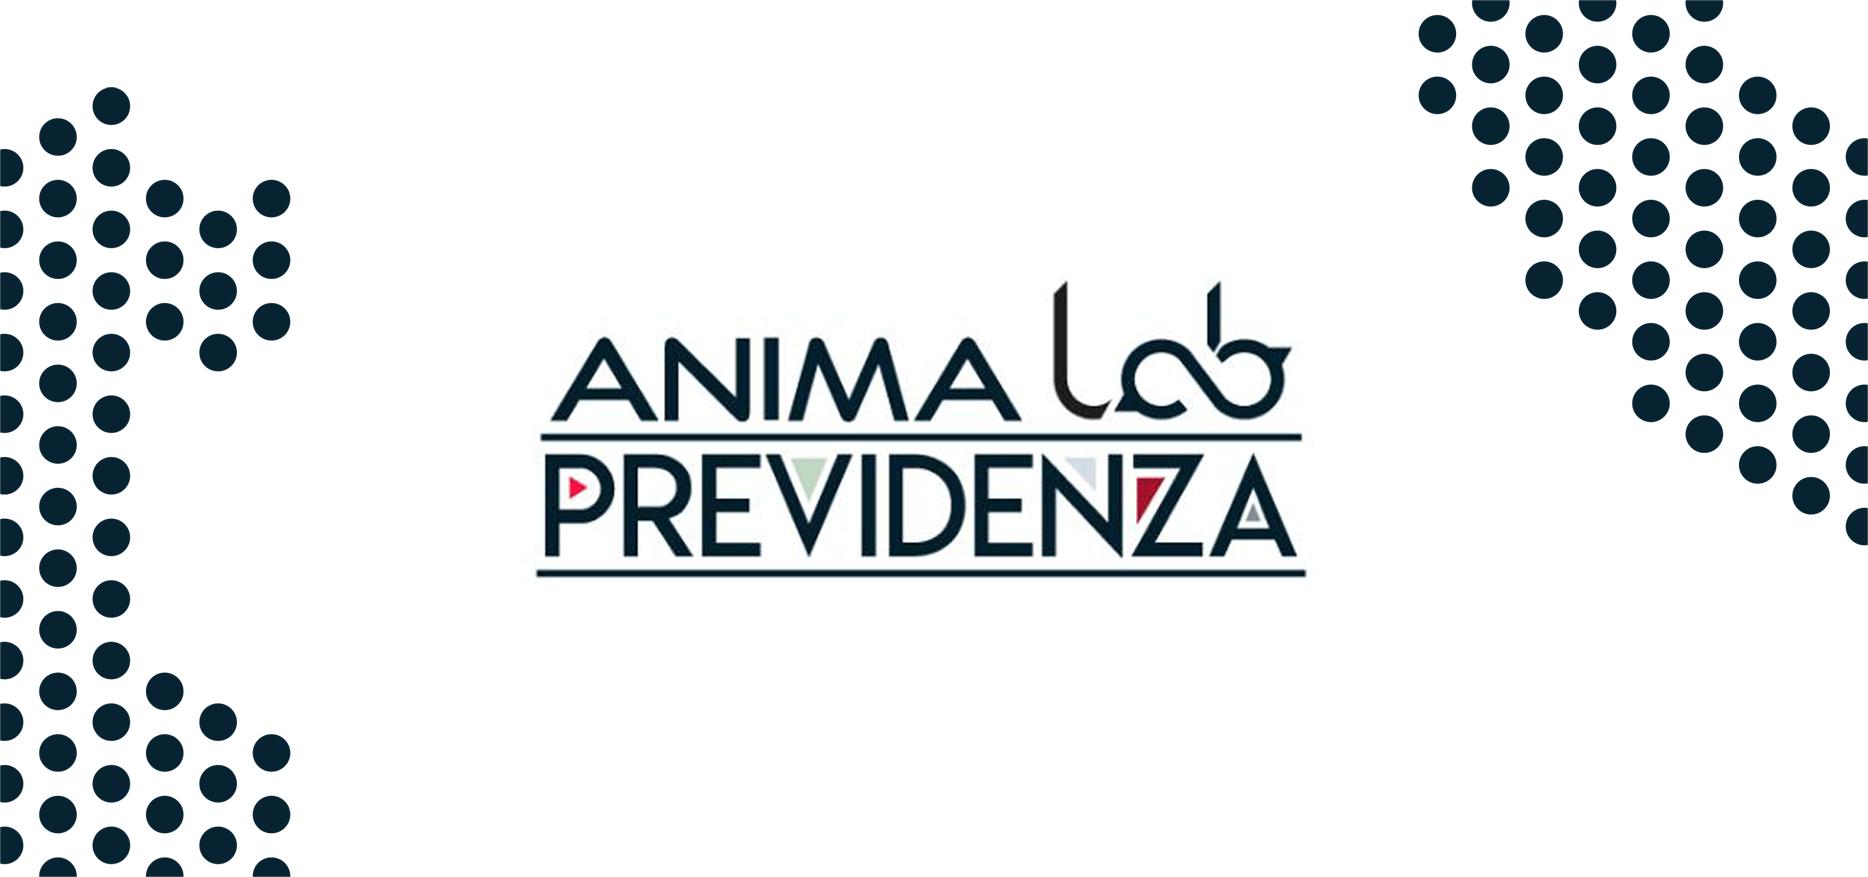 AnimaLab Previdenza Roadshow 2019